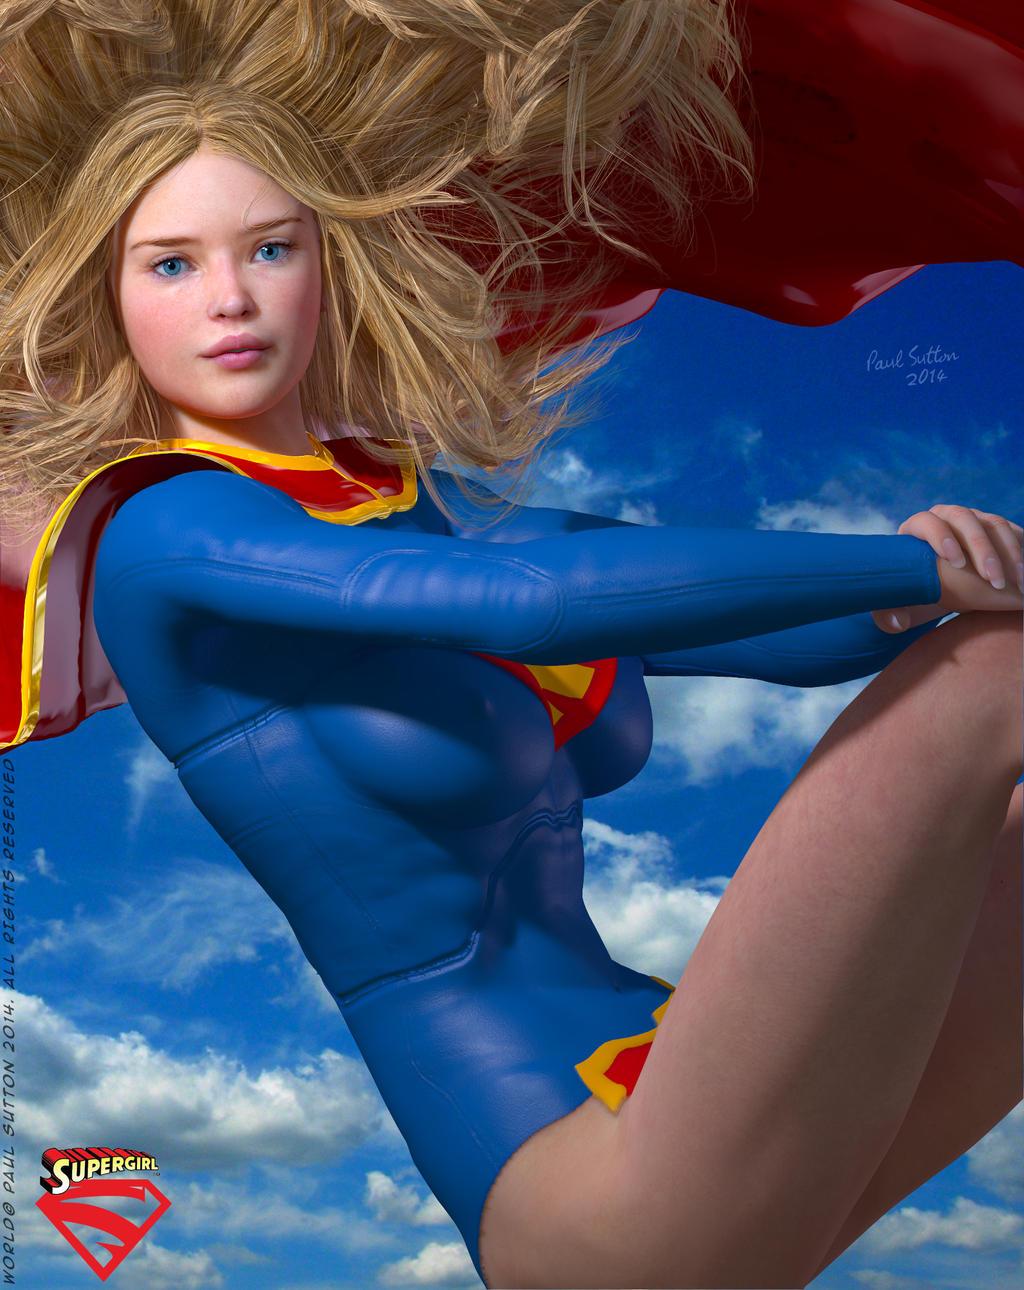 Supergirl Strike a Pose